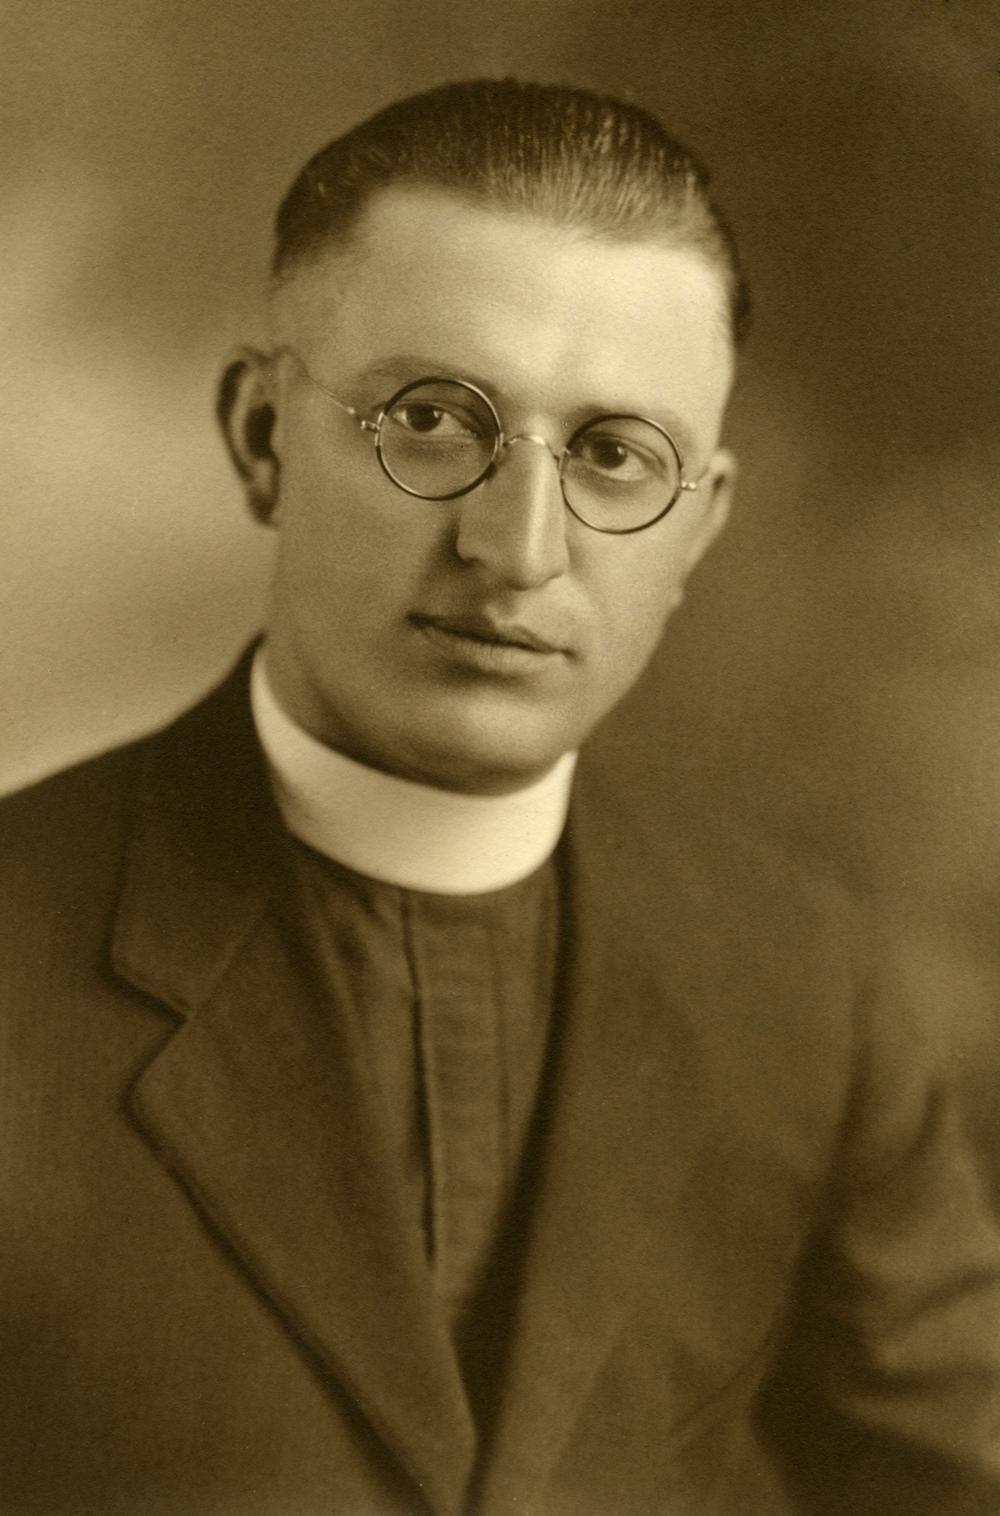 Fr. Matthias Auer, O.S.B.